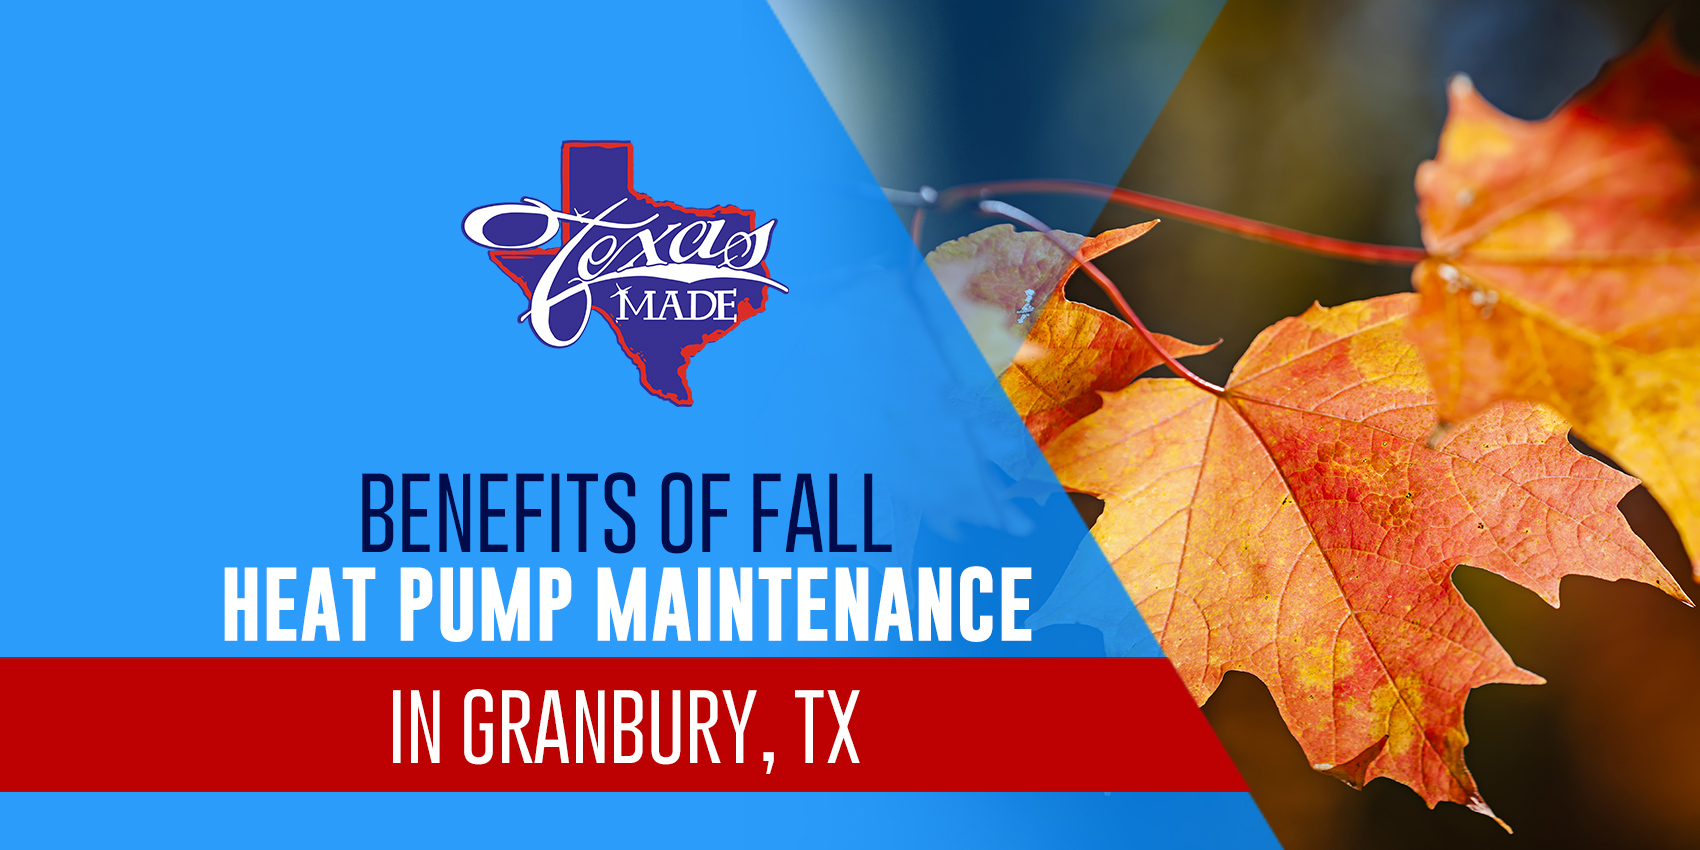 Benefits of Fall Heat Pump Maintenance in Granbury, TX